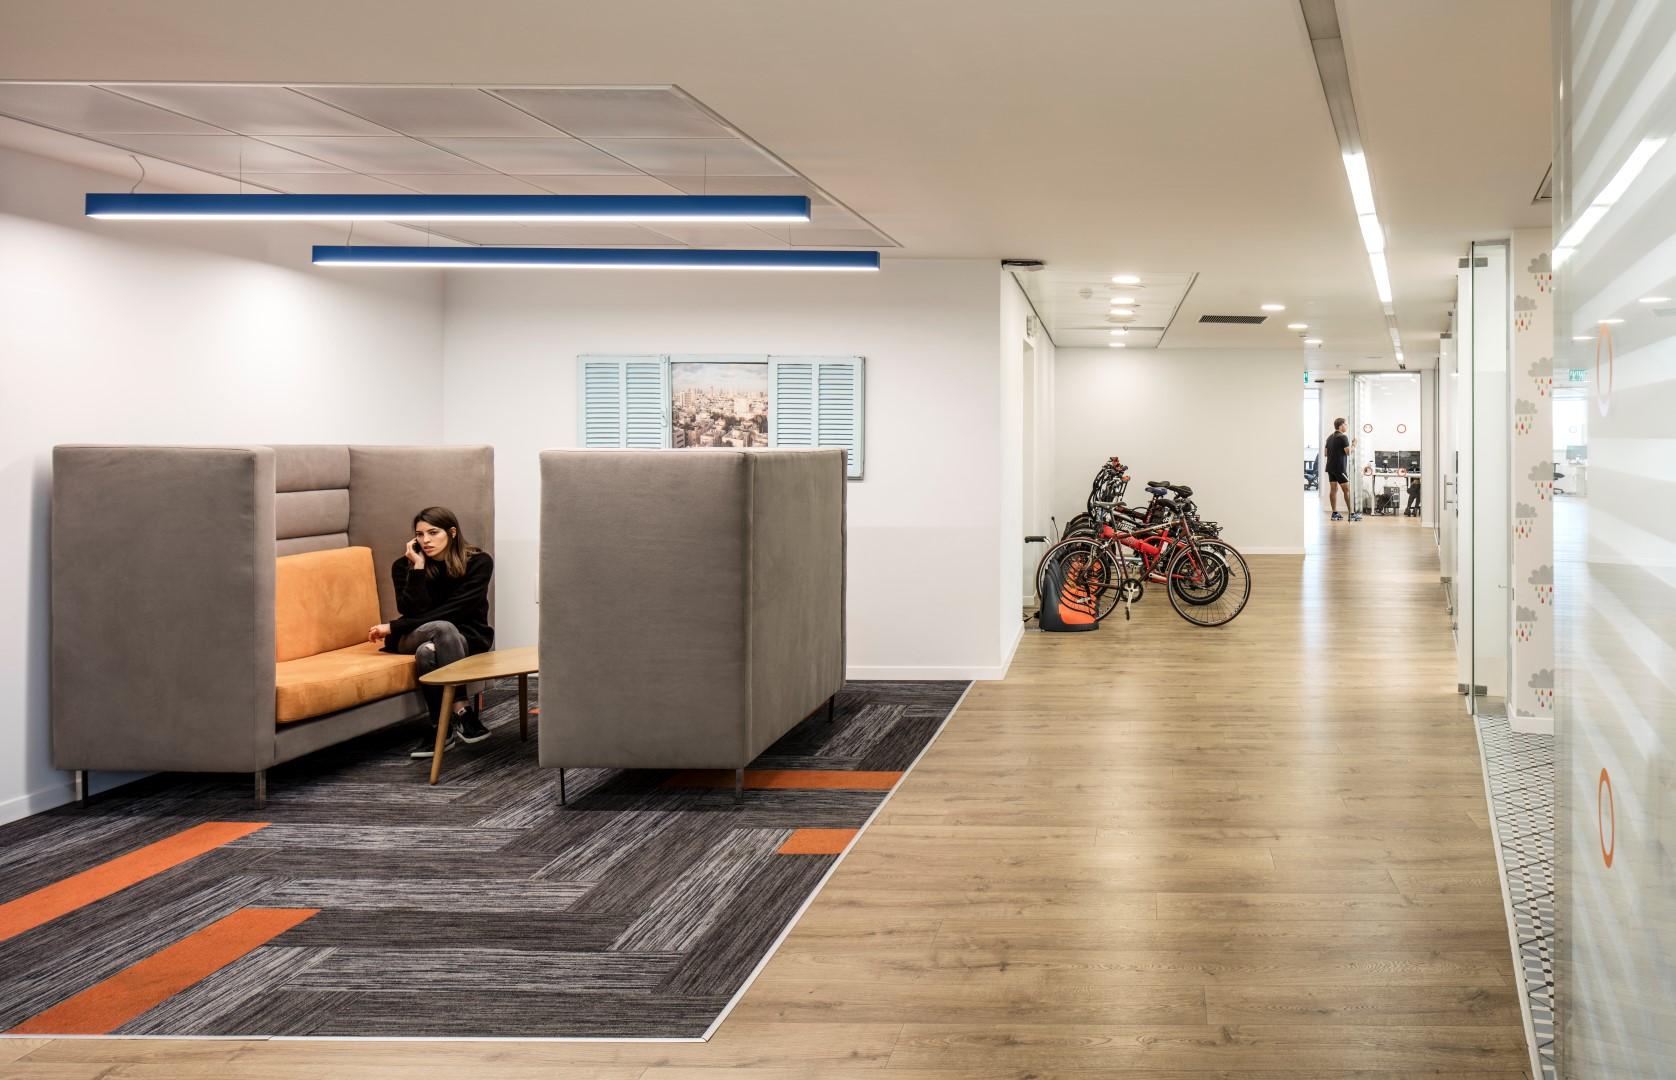 T+R studio תכנון עיצוב פנים למשרדים וסביבת עבודה טלי ורקפת